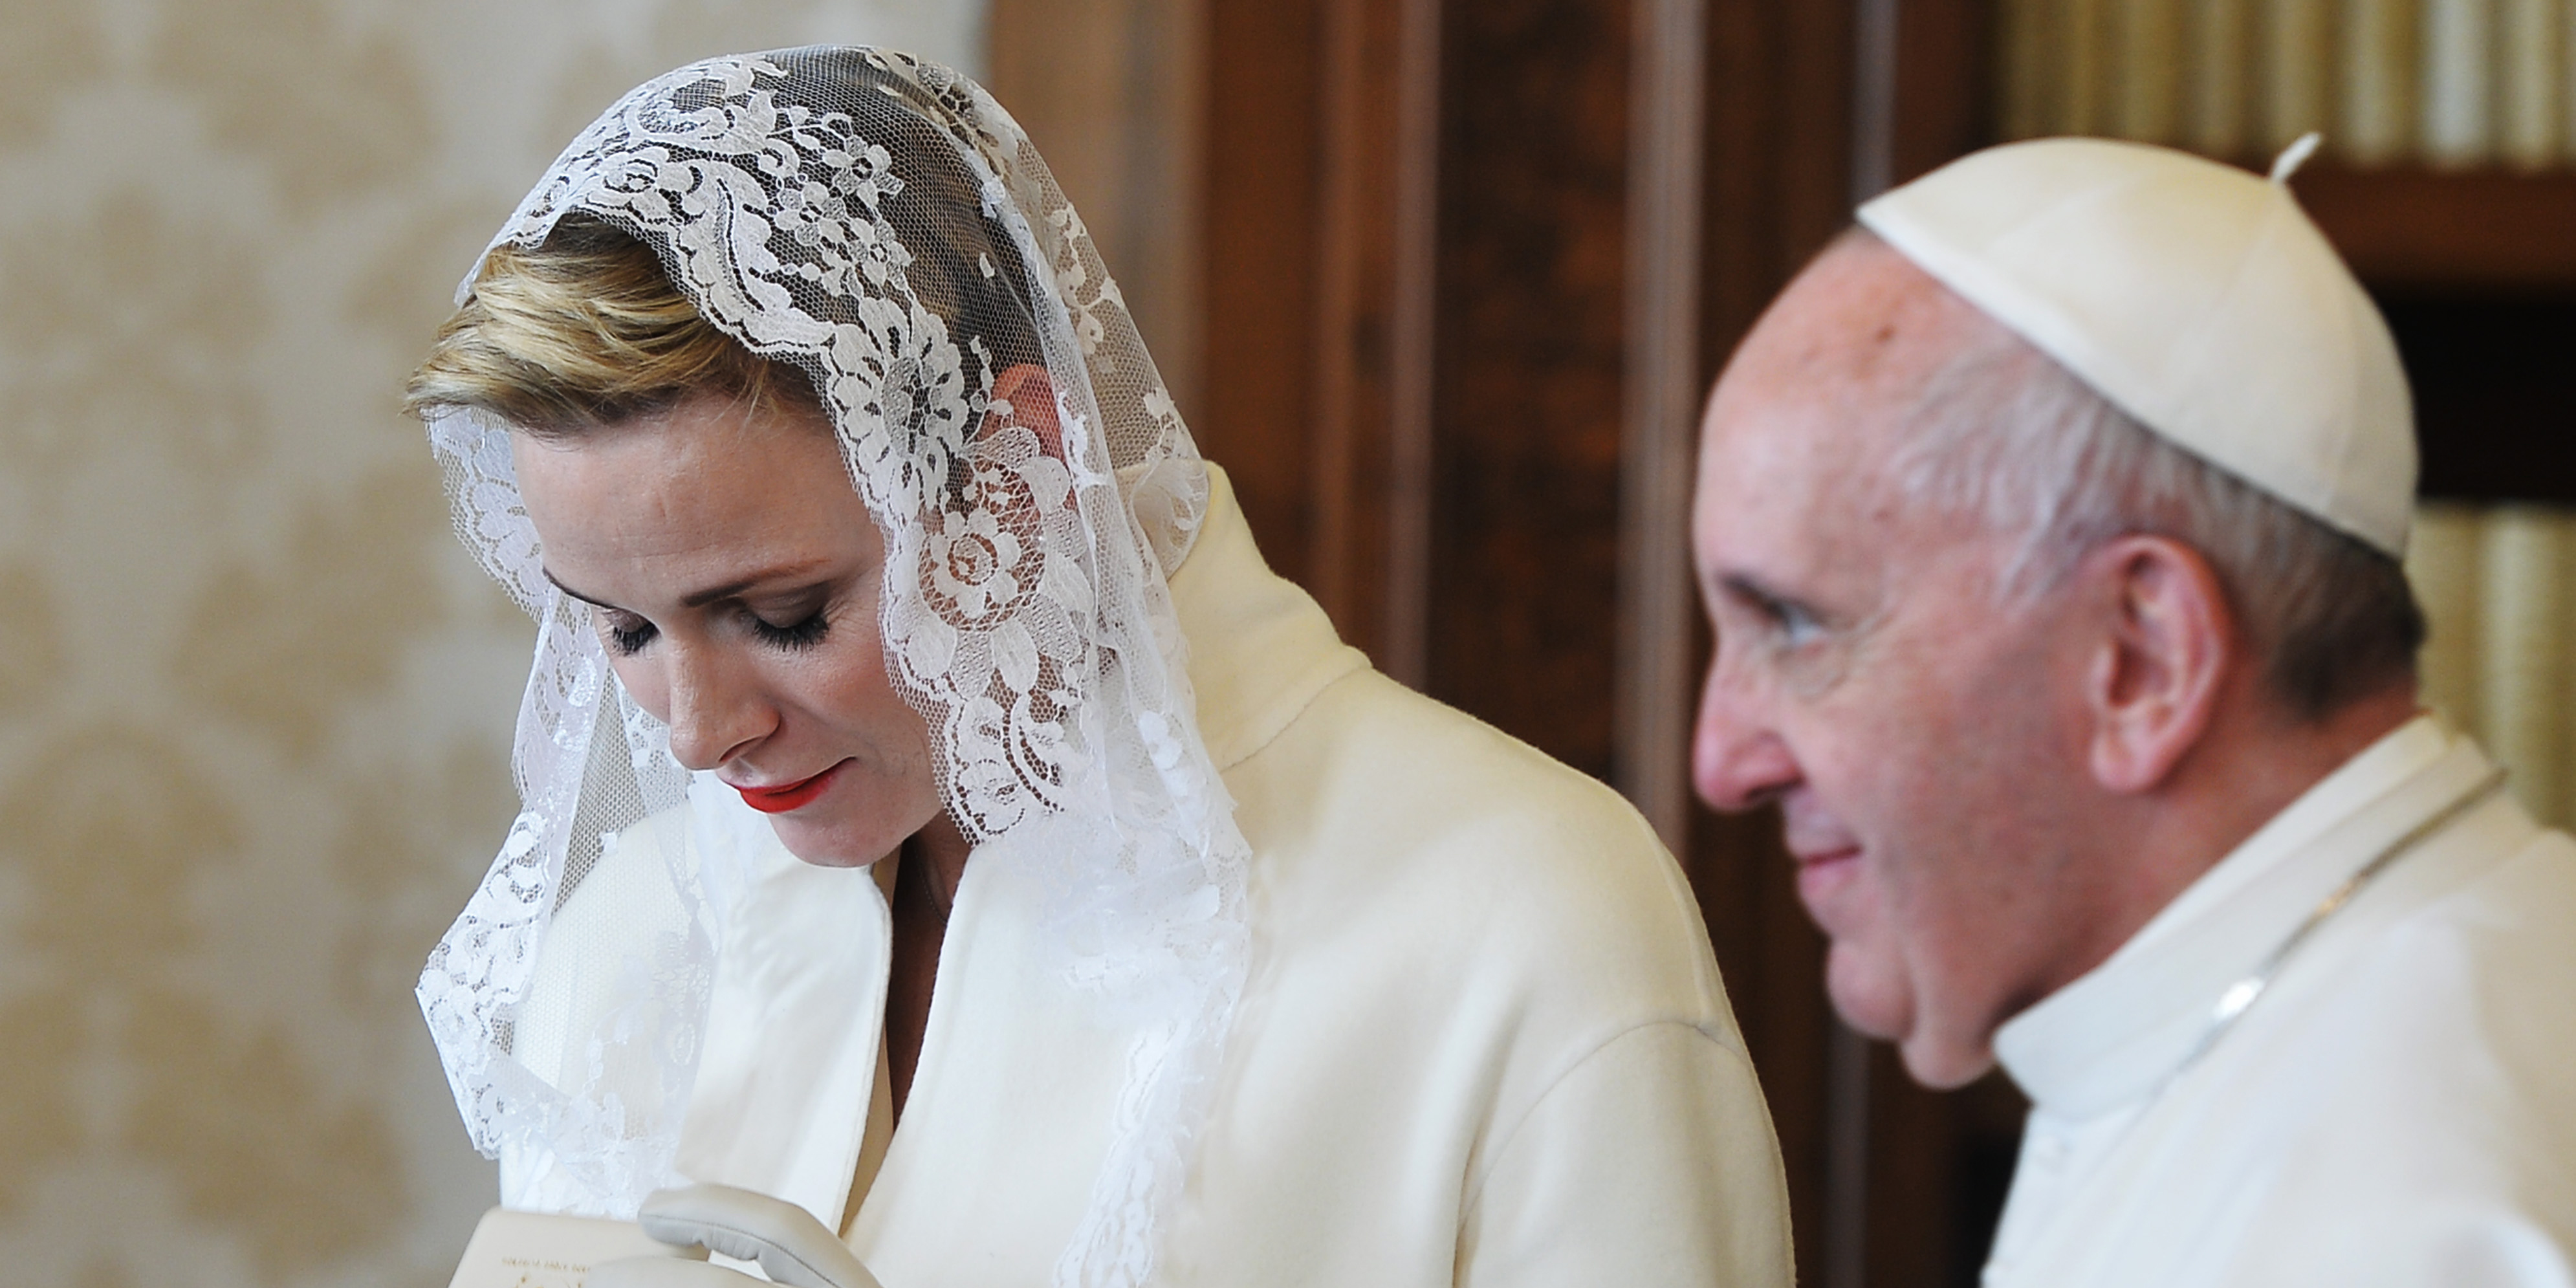 CHARLENE MONACO POPE